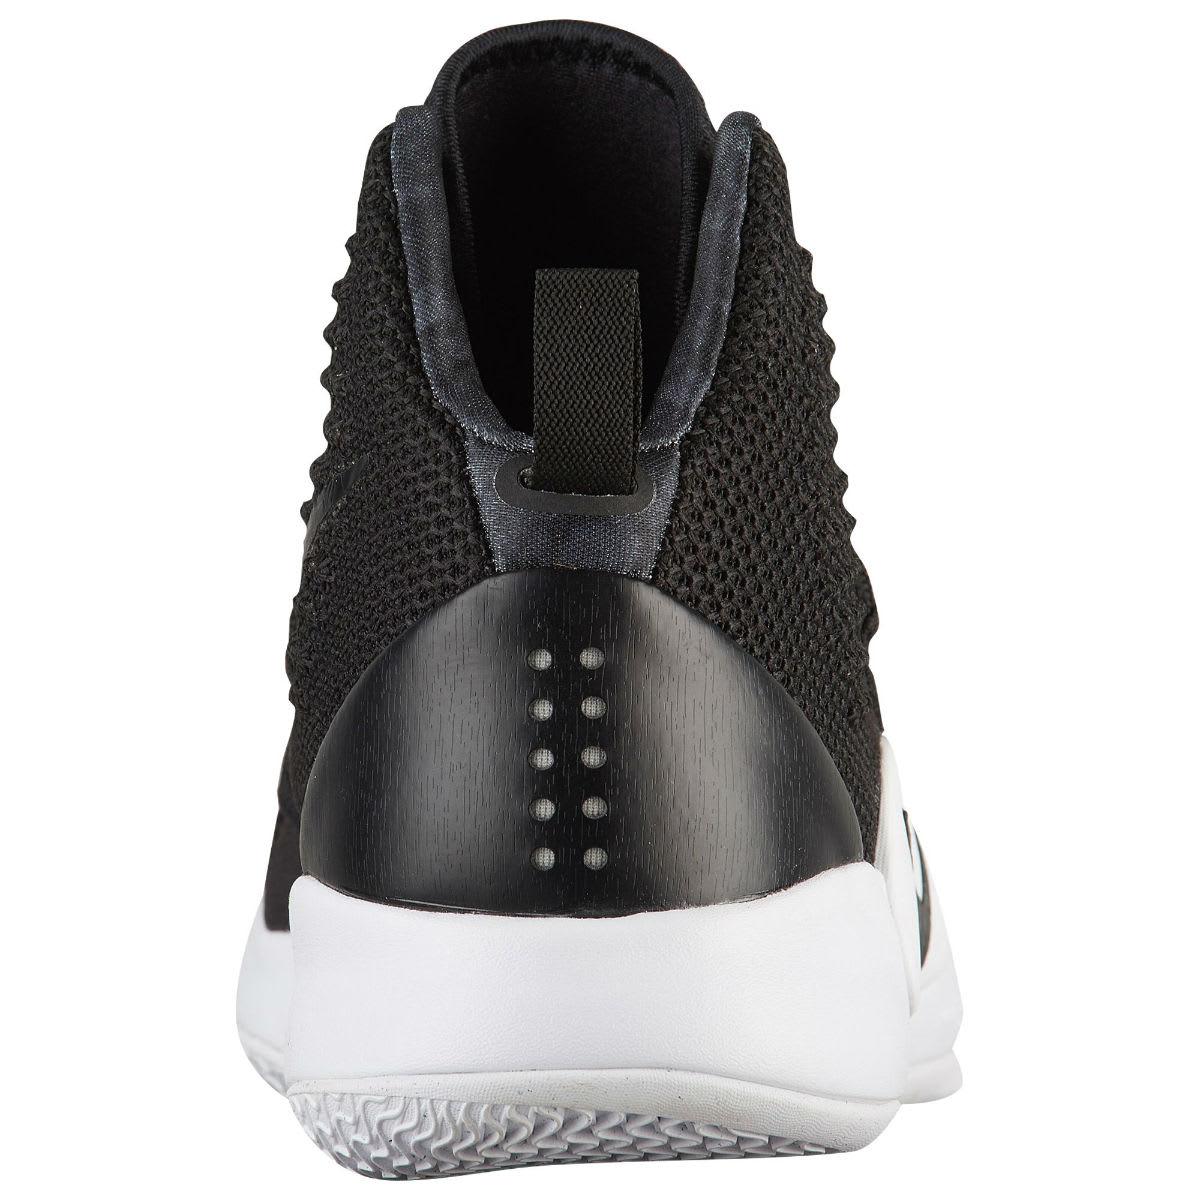 new product 8ae27 19d46 ... low cost image via foot locker nike hyperdunk x 2018 black release date  ar0467 001 heel